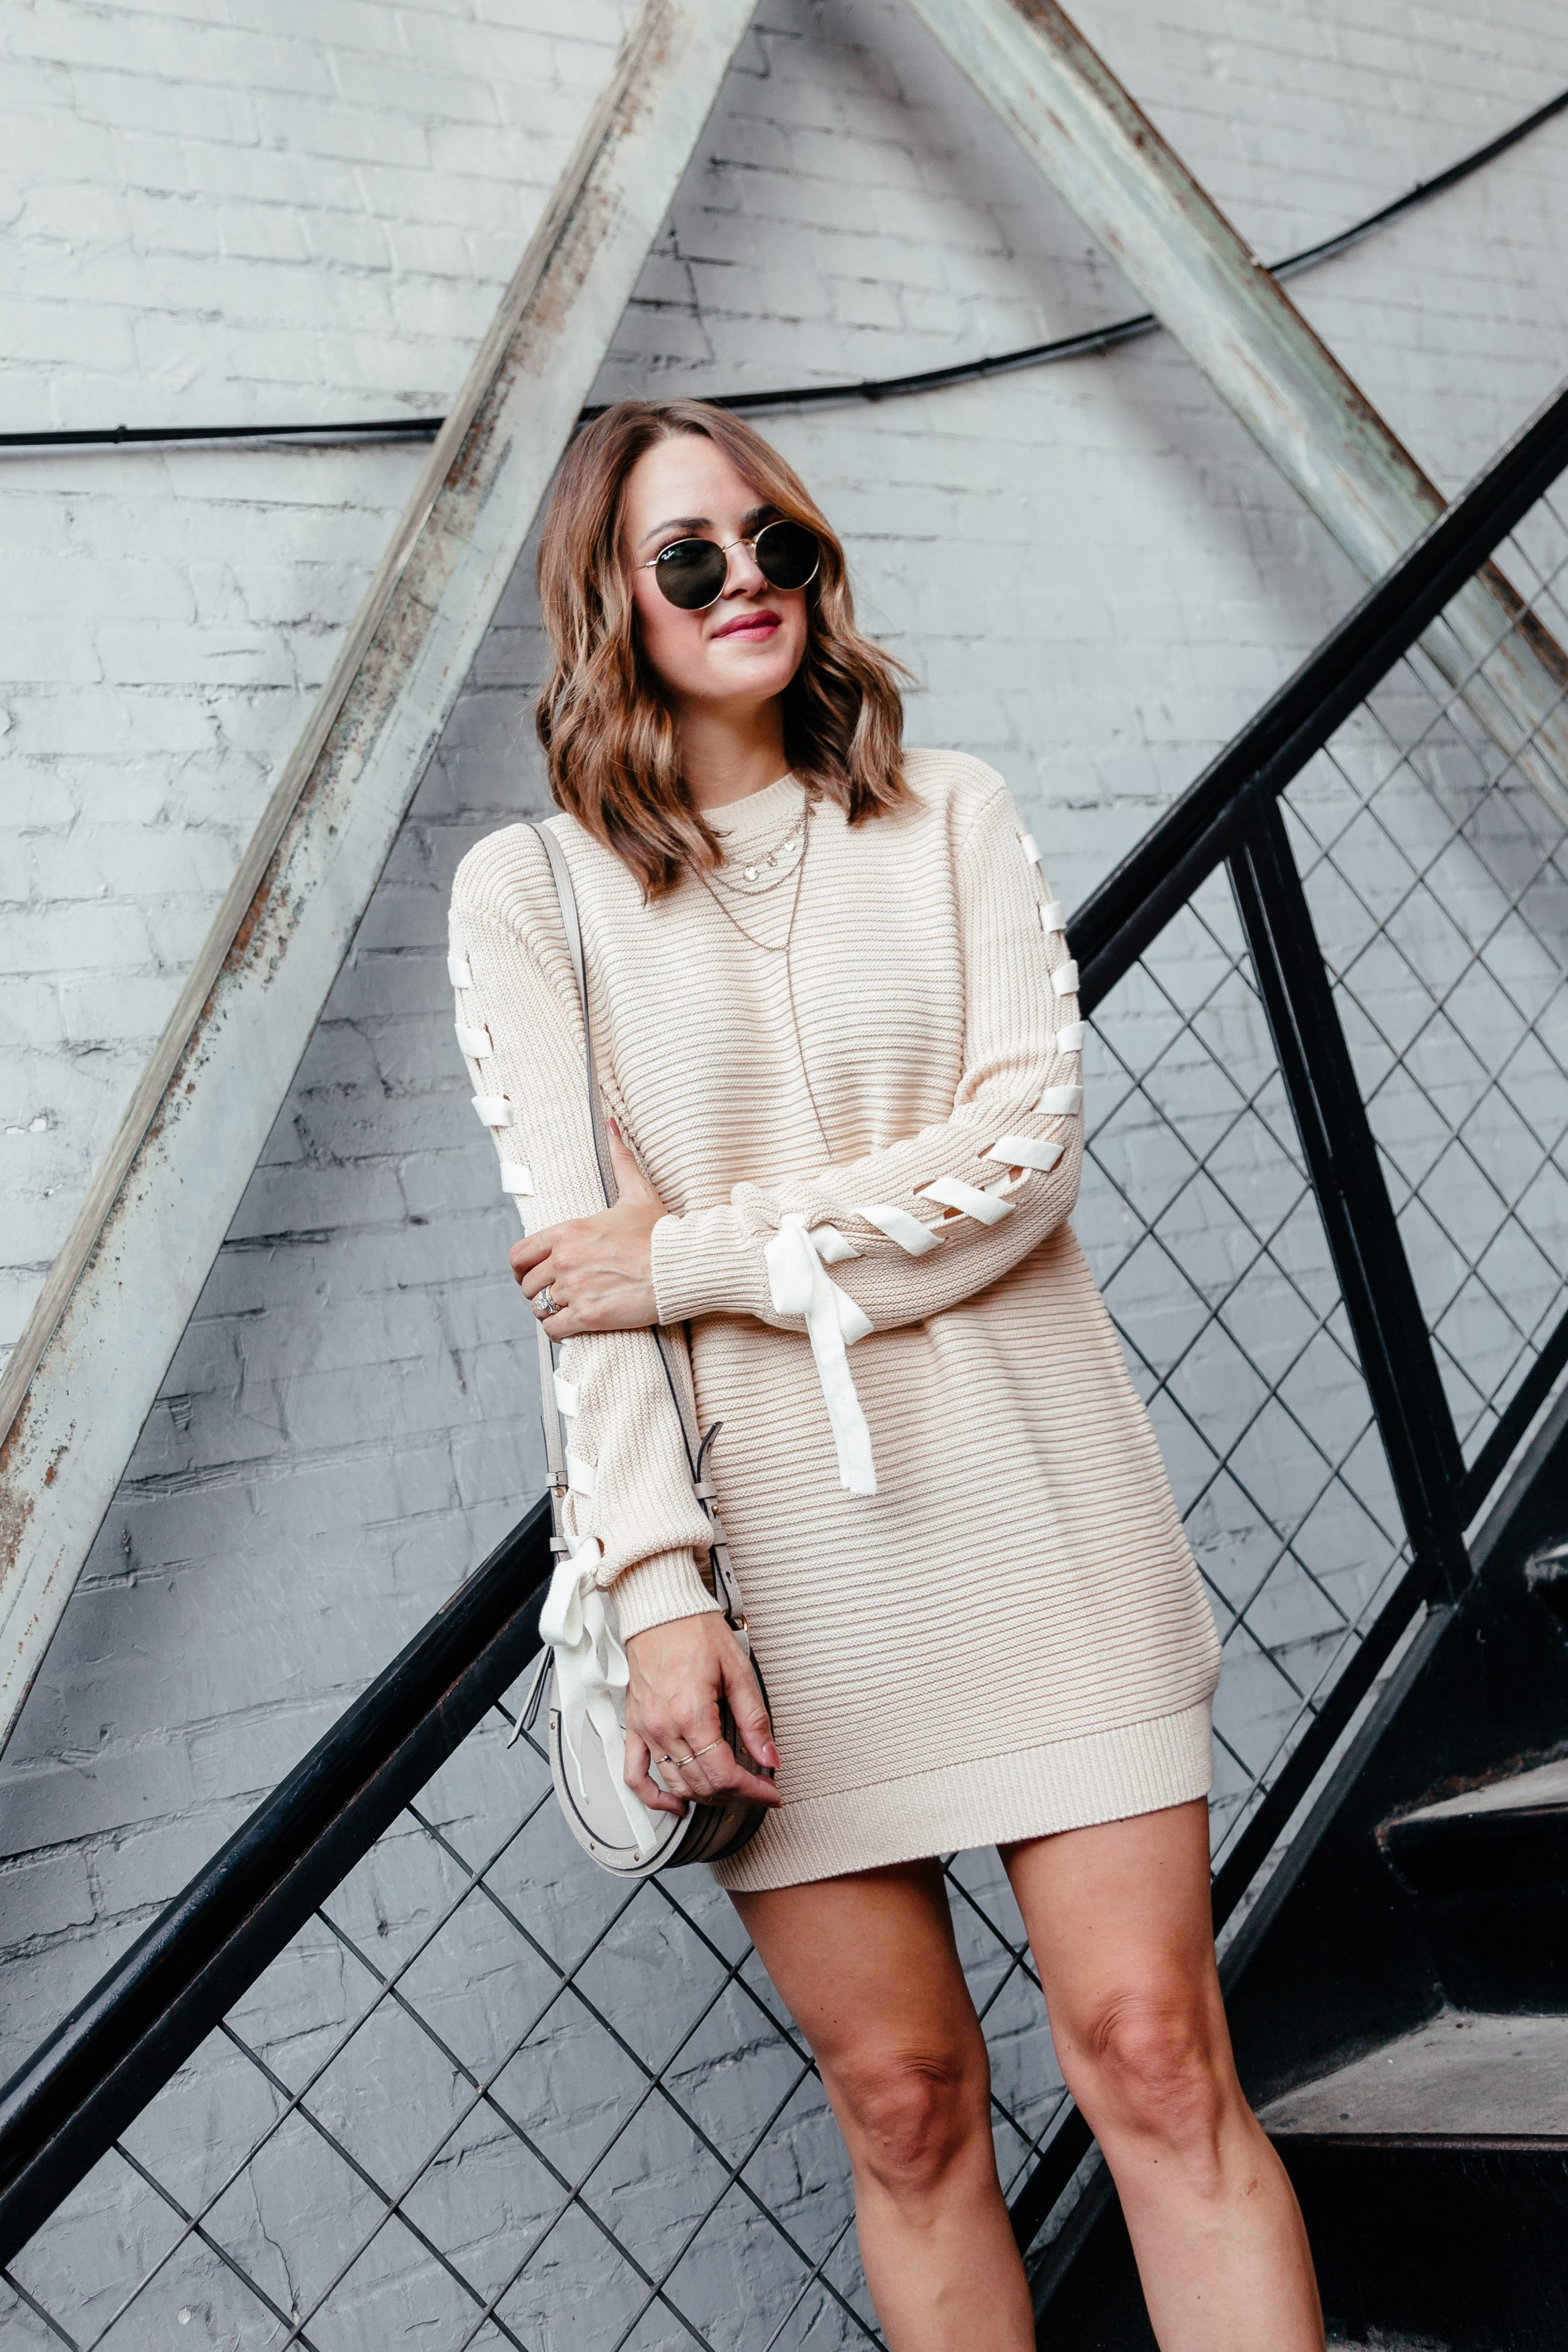 44f44f422c0 Sweater Dresses. Sweater Dress. Sweater Dresses for Fall. Sweater Dress for  Winter.